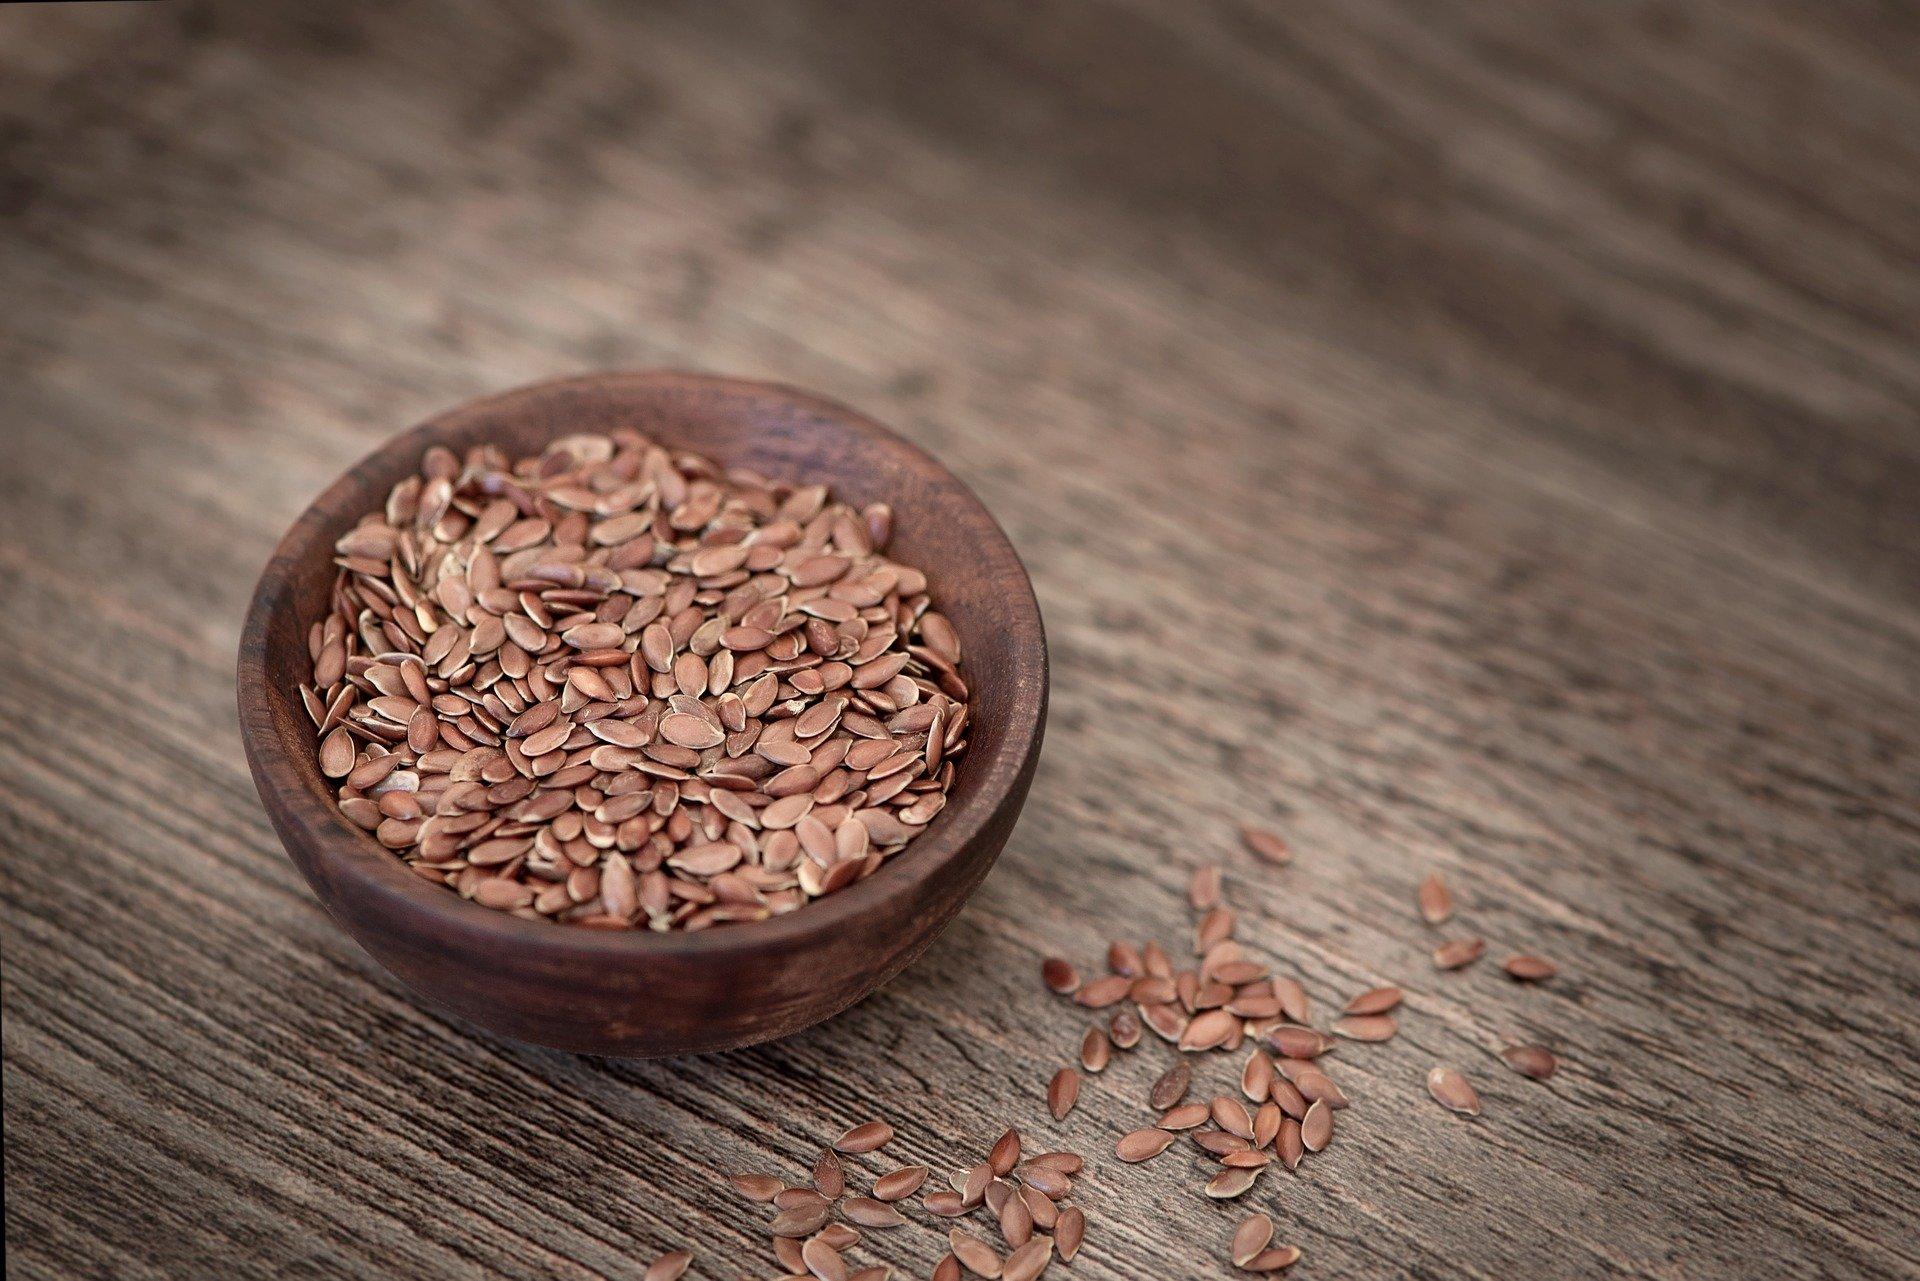 semi di lino per dieta menopausa